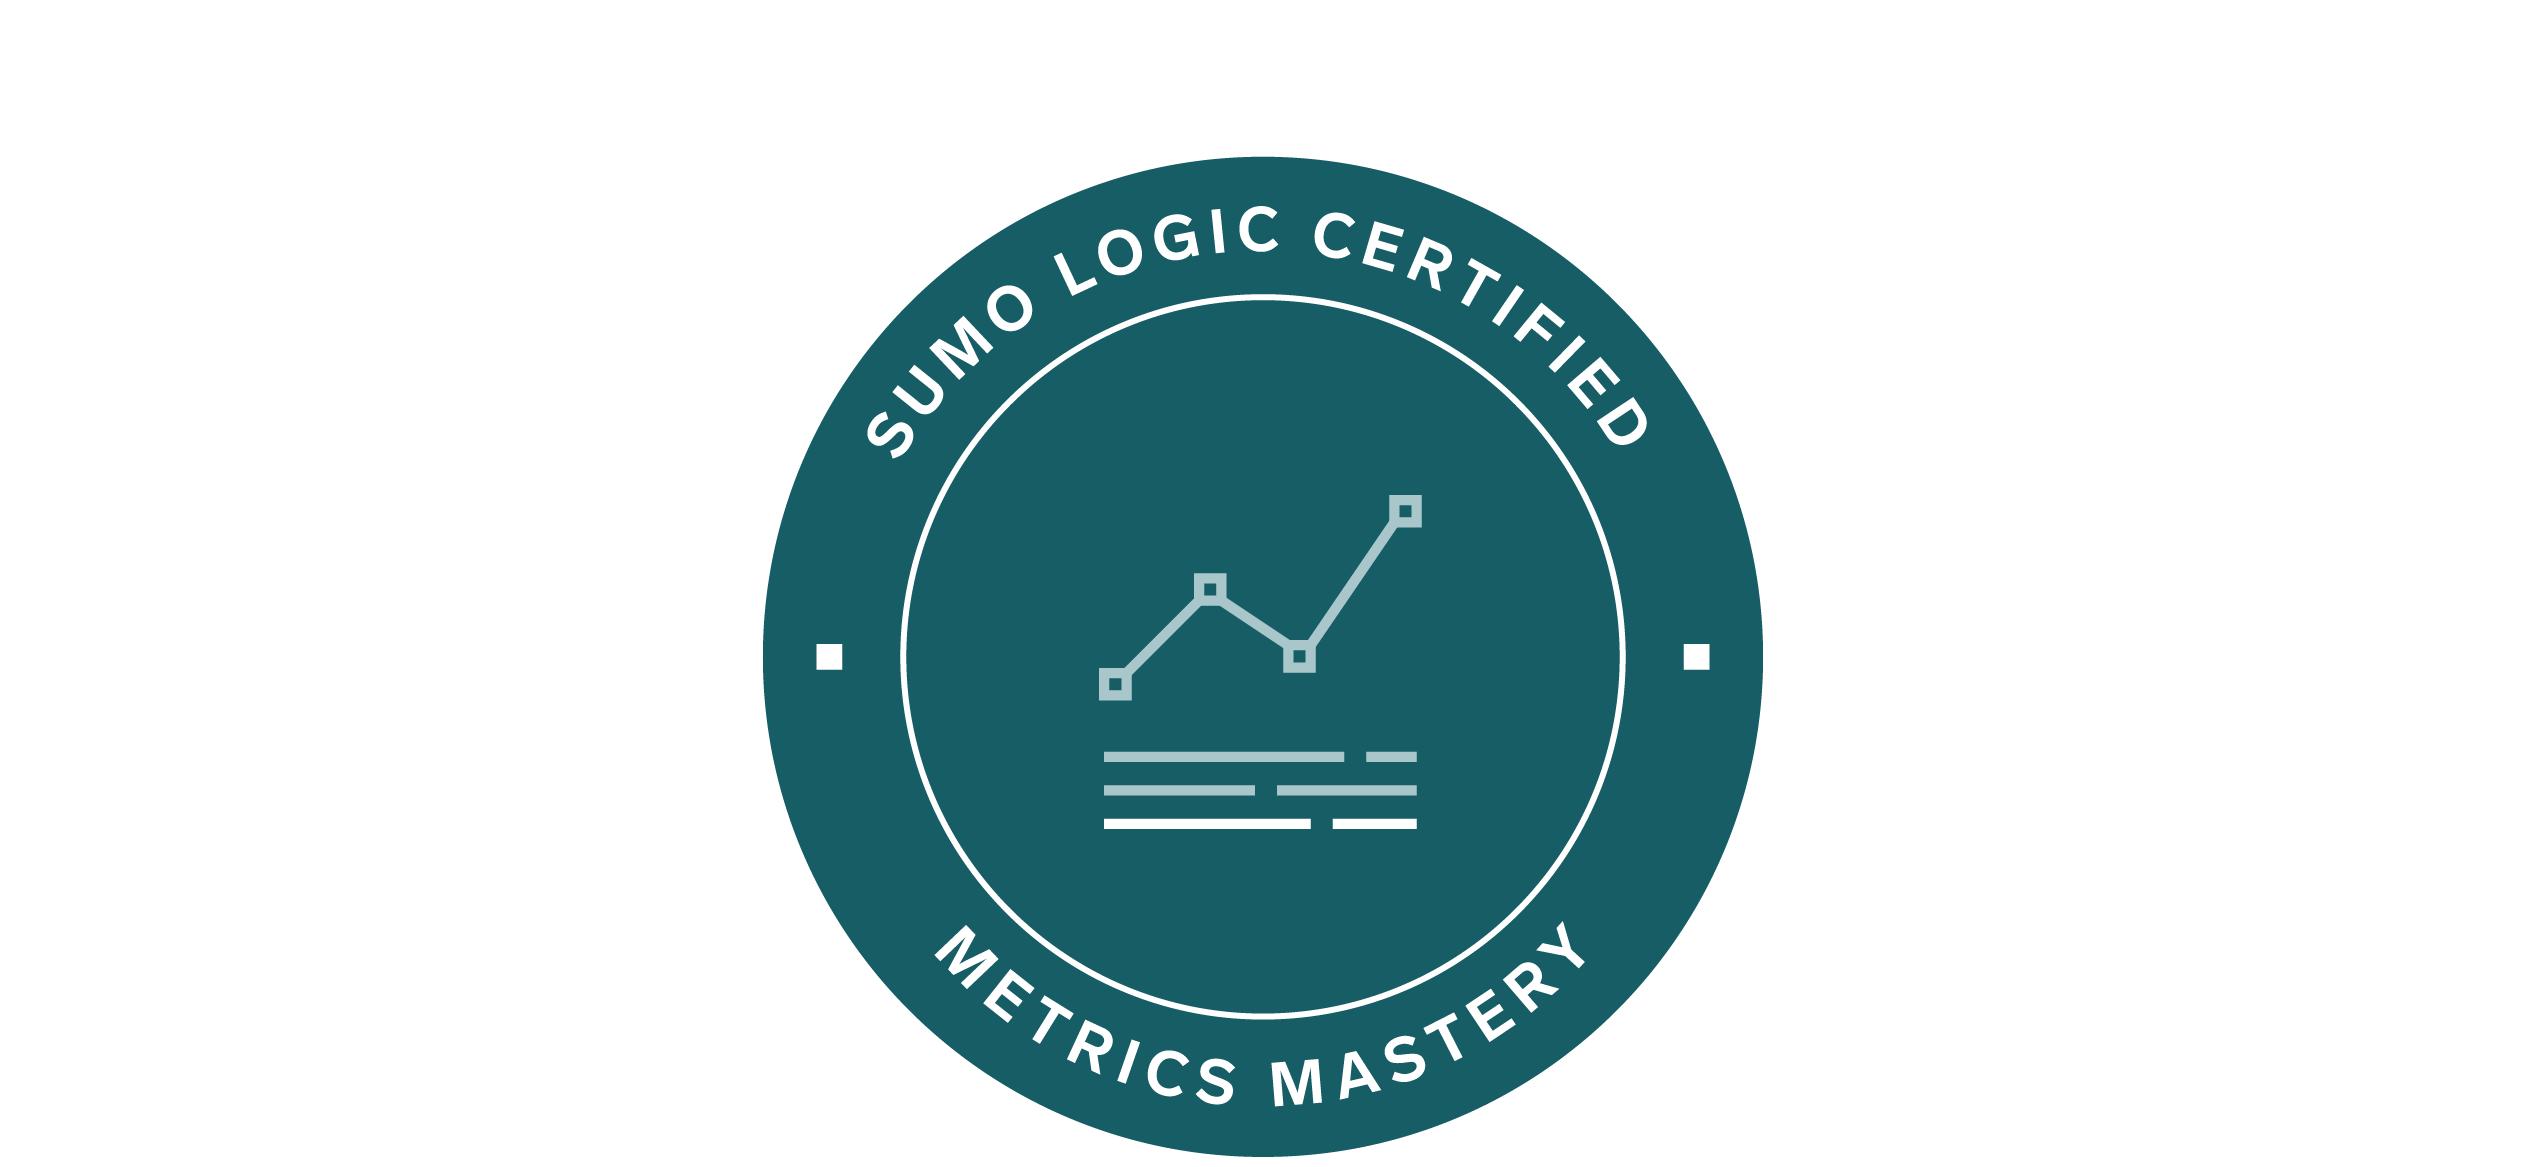 Certification metrics mastery